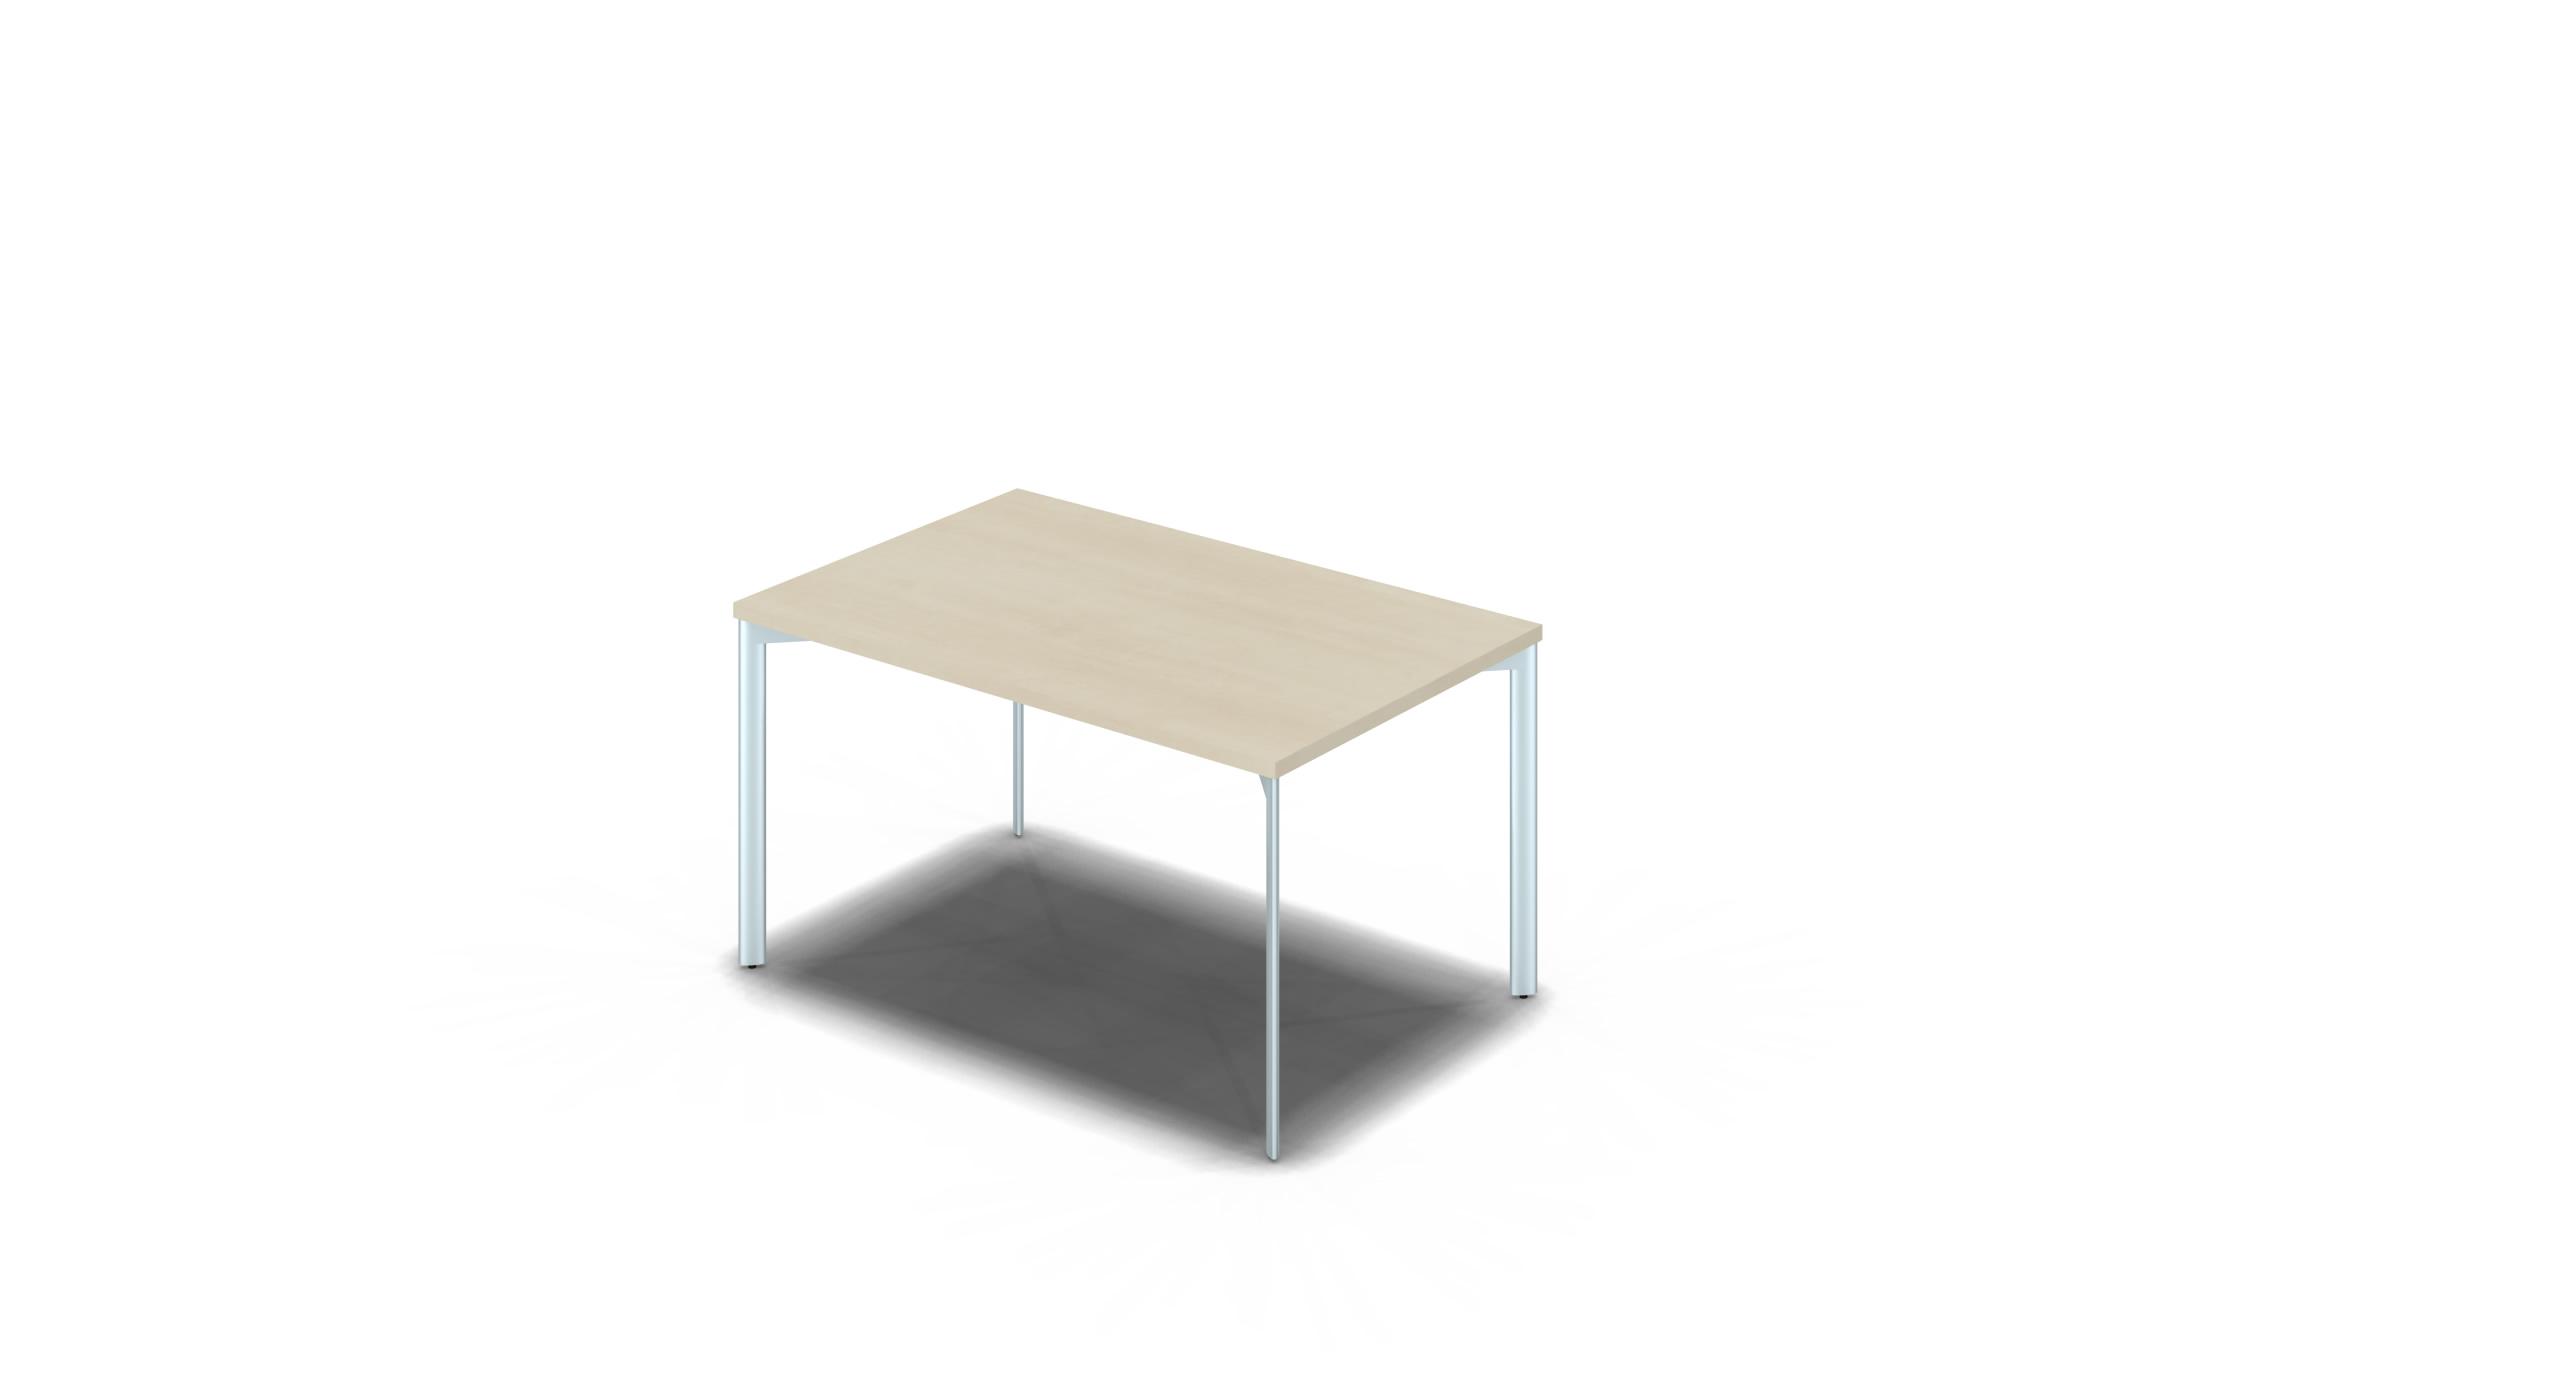 Table_Slim_1200x750_Silver_Maple_noOption